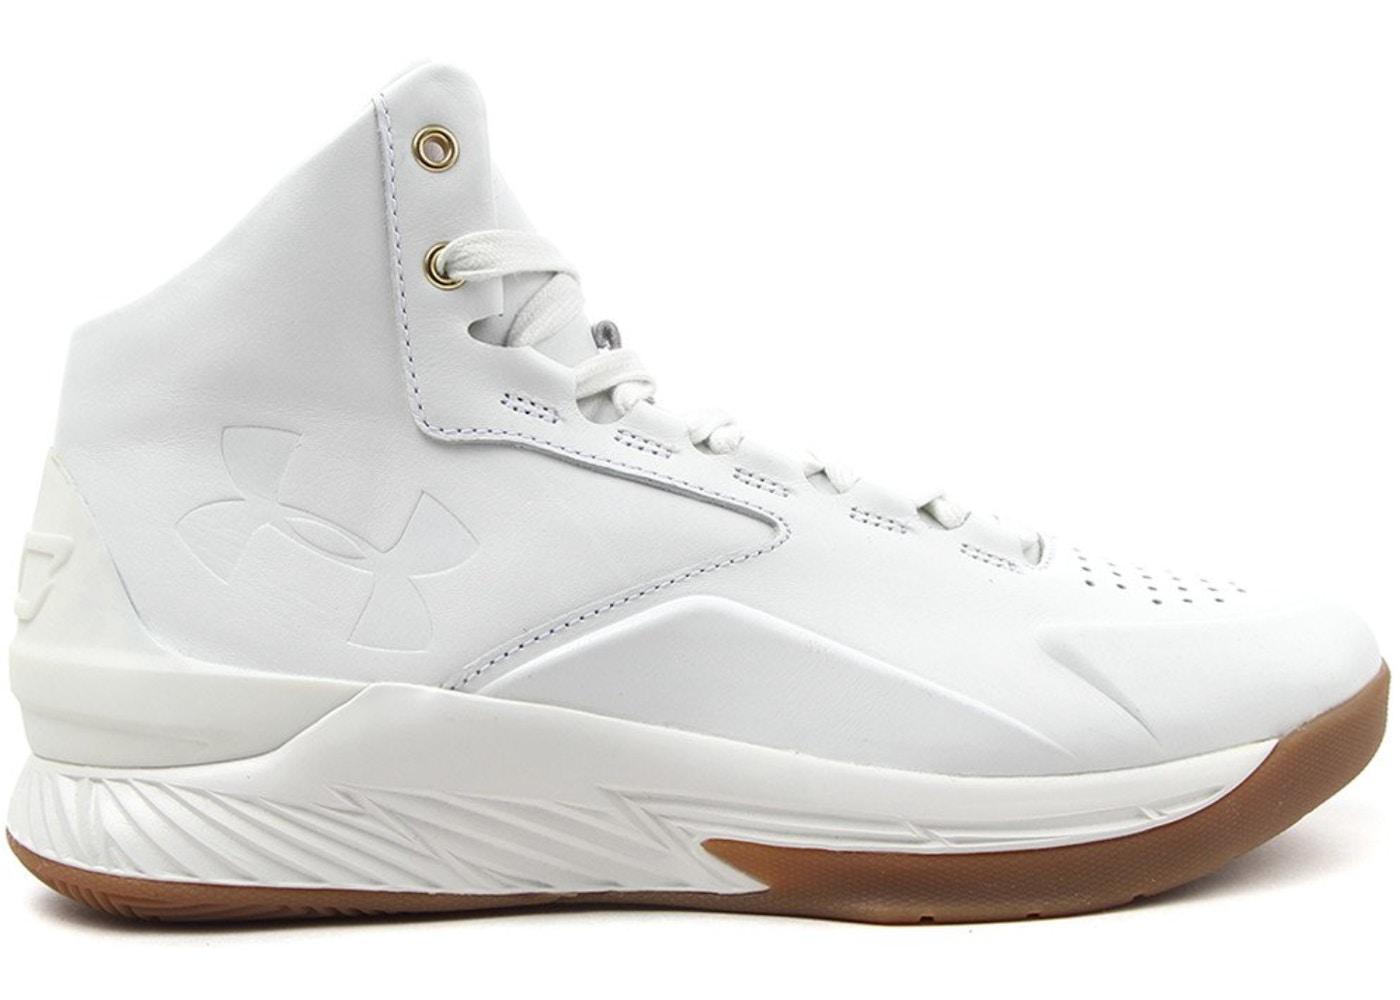 lowest price 8c02a 601c2 UA Curry 1 Lux White Gum